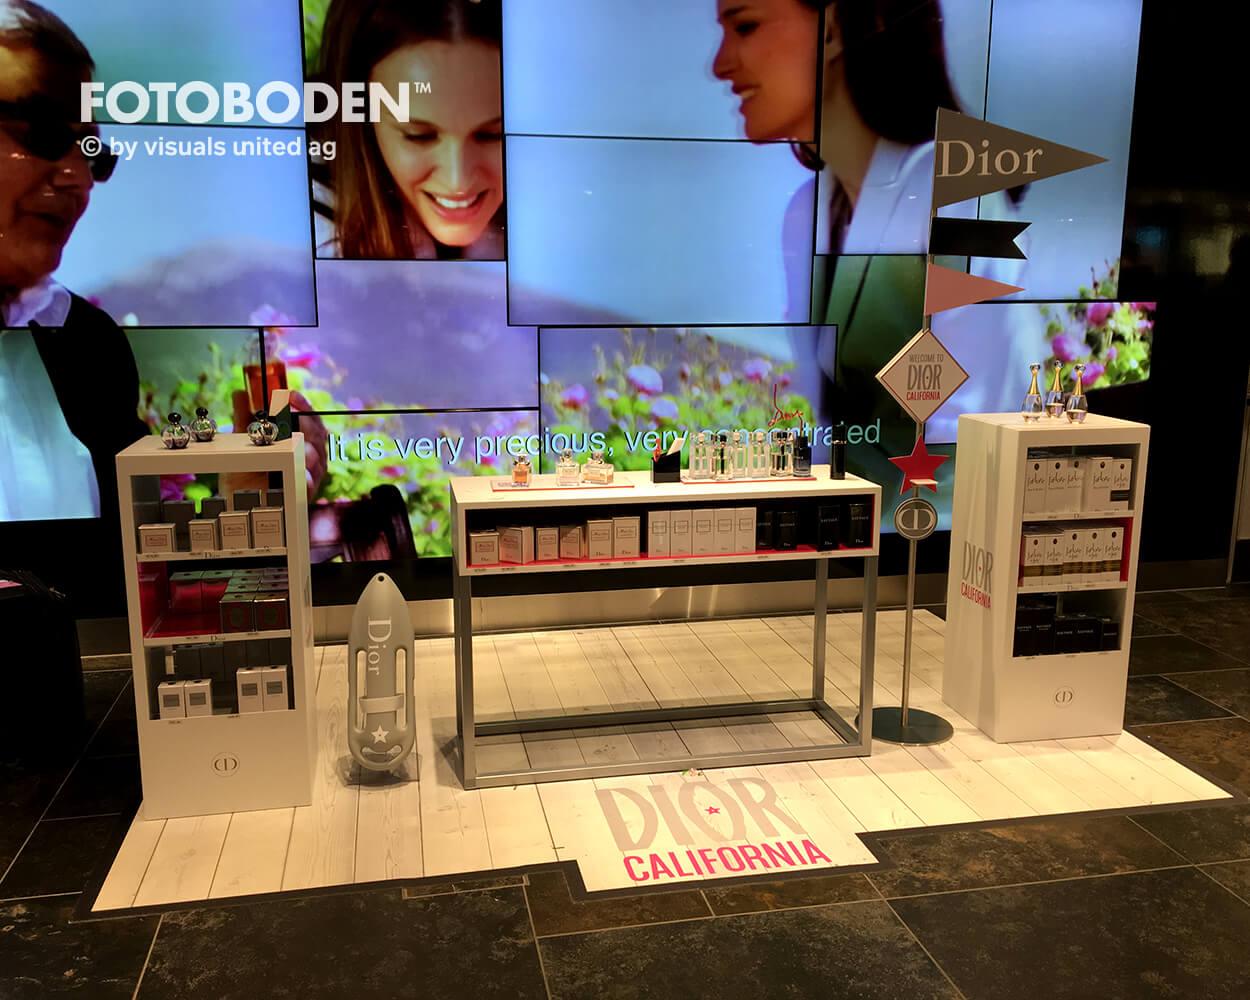 Dior Fotoboden Flooring Fußboden Bodengestaltung Floorminder Bodendruck Werbung Fußbodenwerbung Bodenwerbung Merchandising Advertising Visualmerchandising